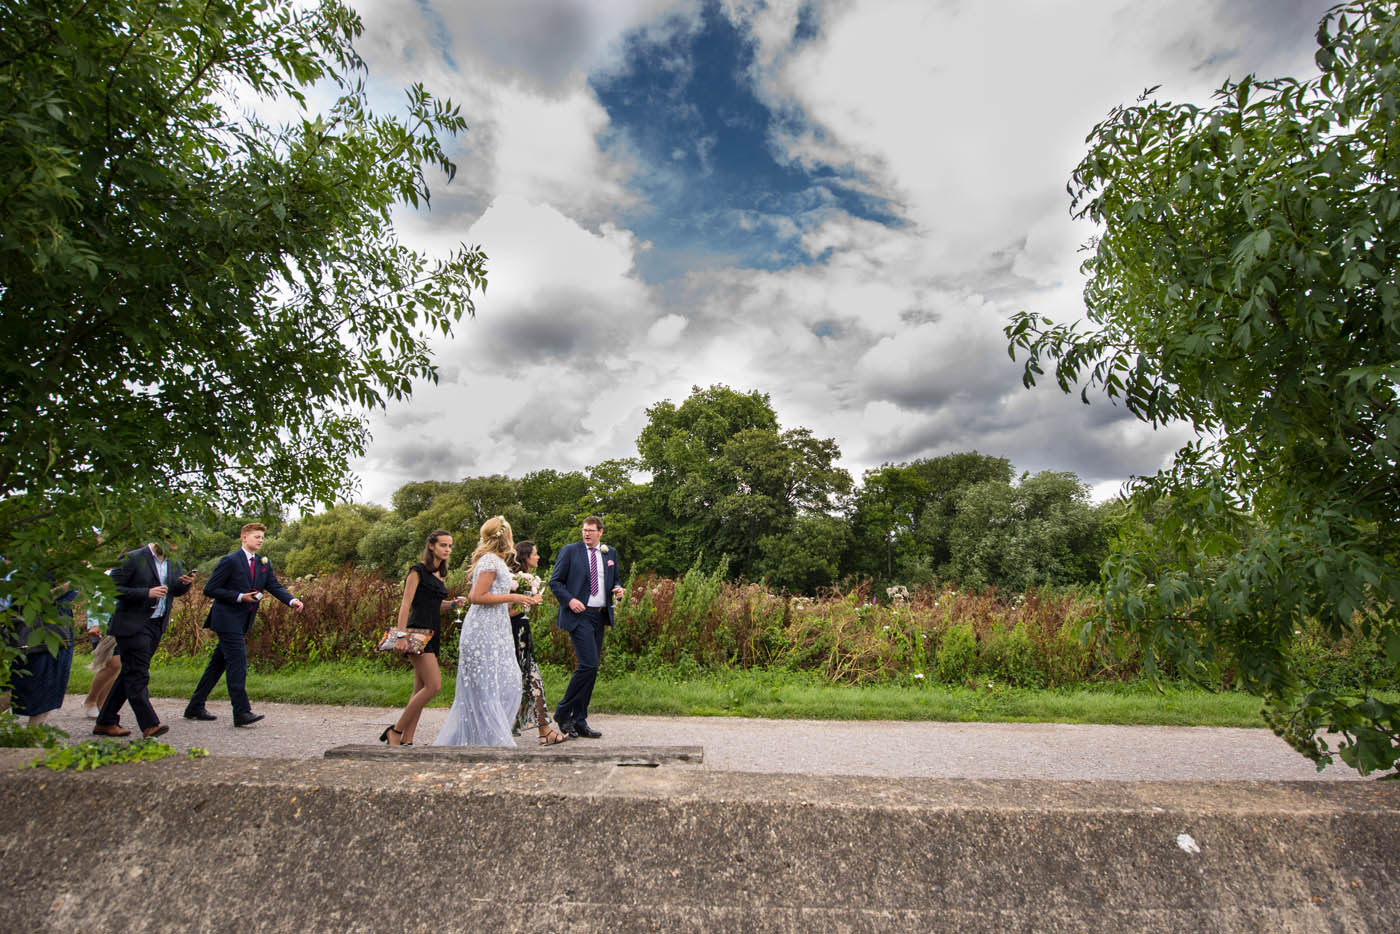 WEDDING-GUESTS-RIVER-WALK-RICHMOND.jpg